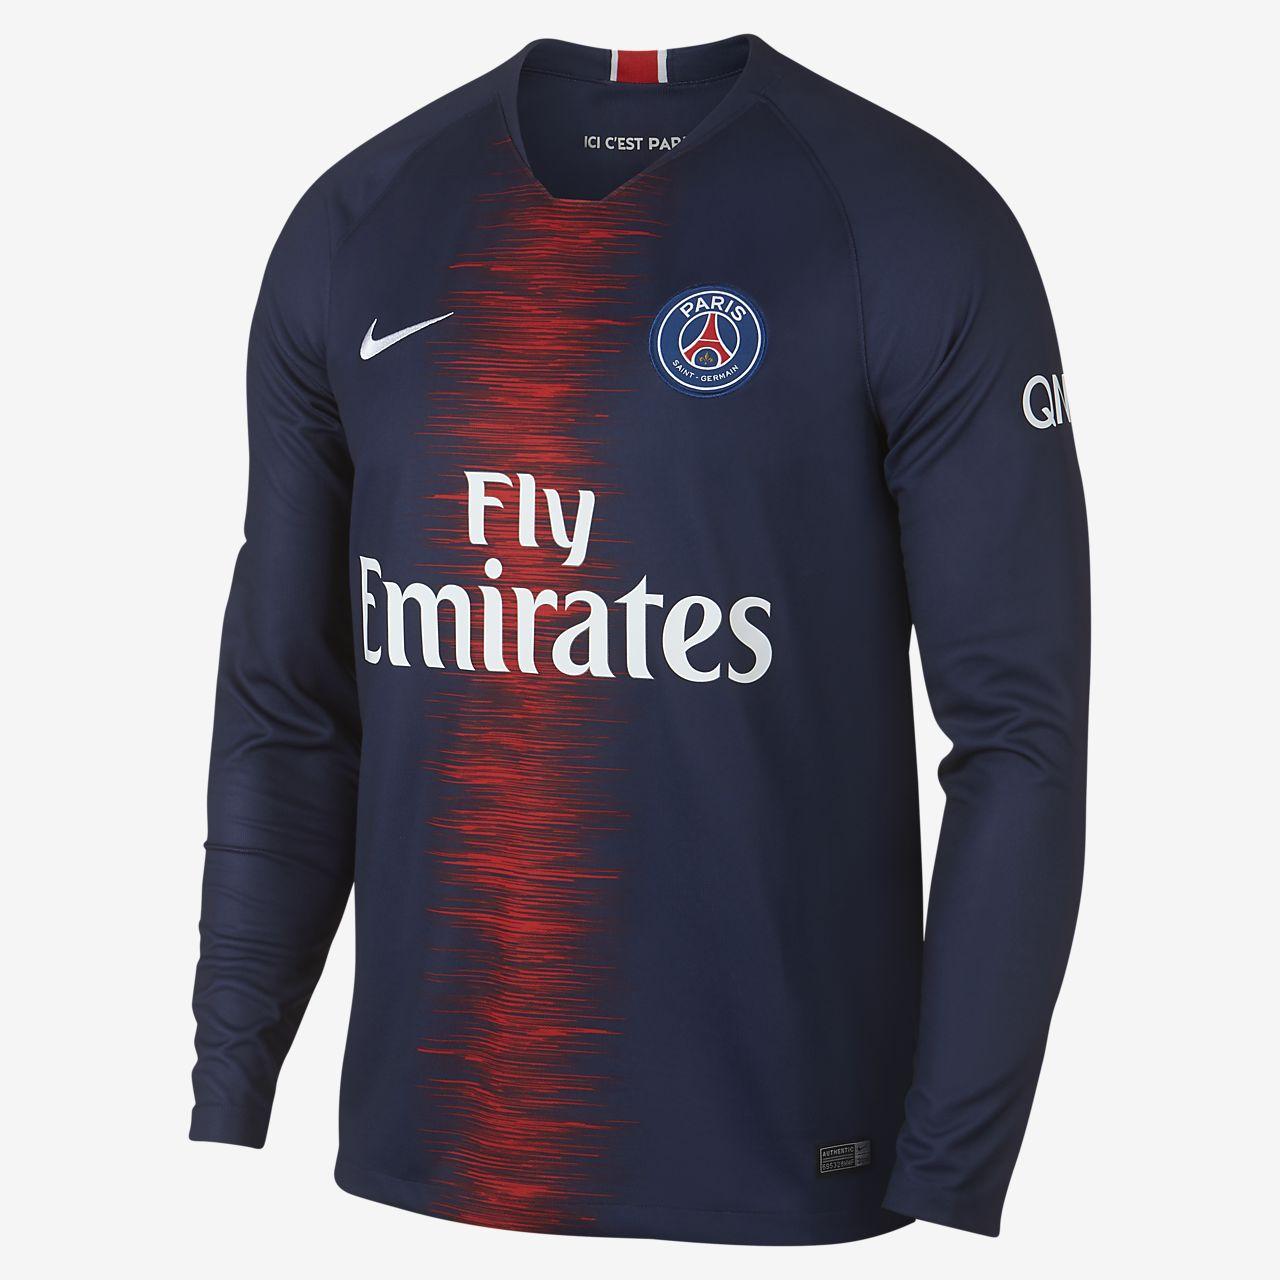 61b118801 Men's Long-Sleeve Football Shirt. 2018/19 Paris Saint-Germain Stadium Home